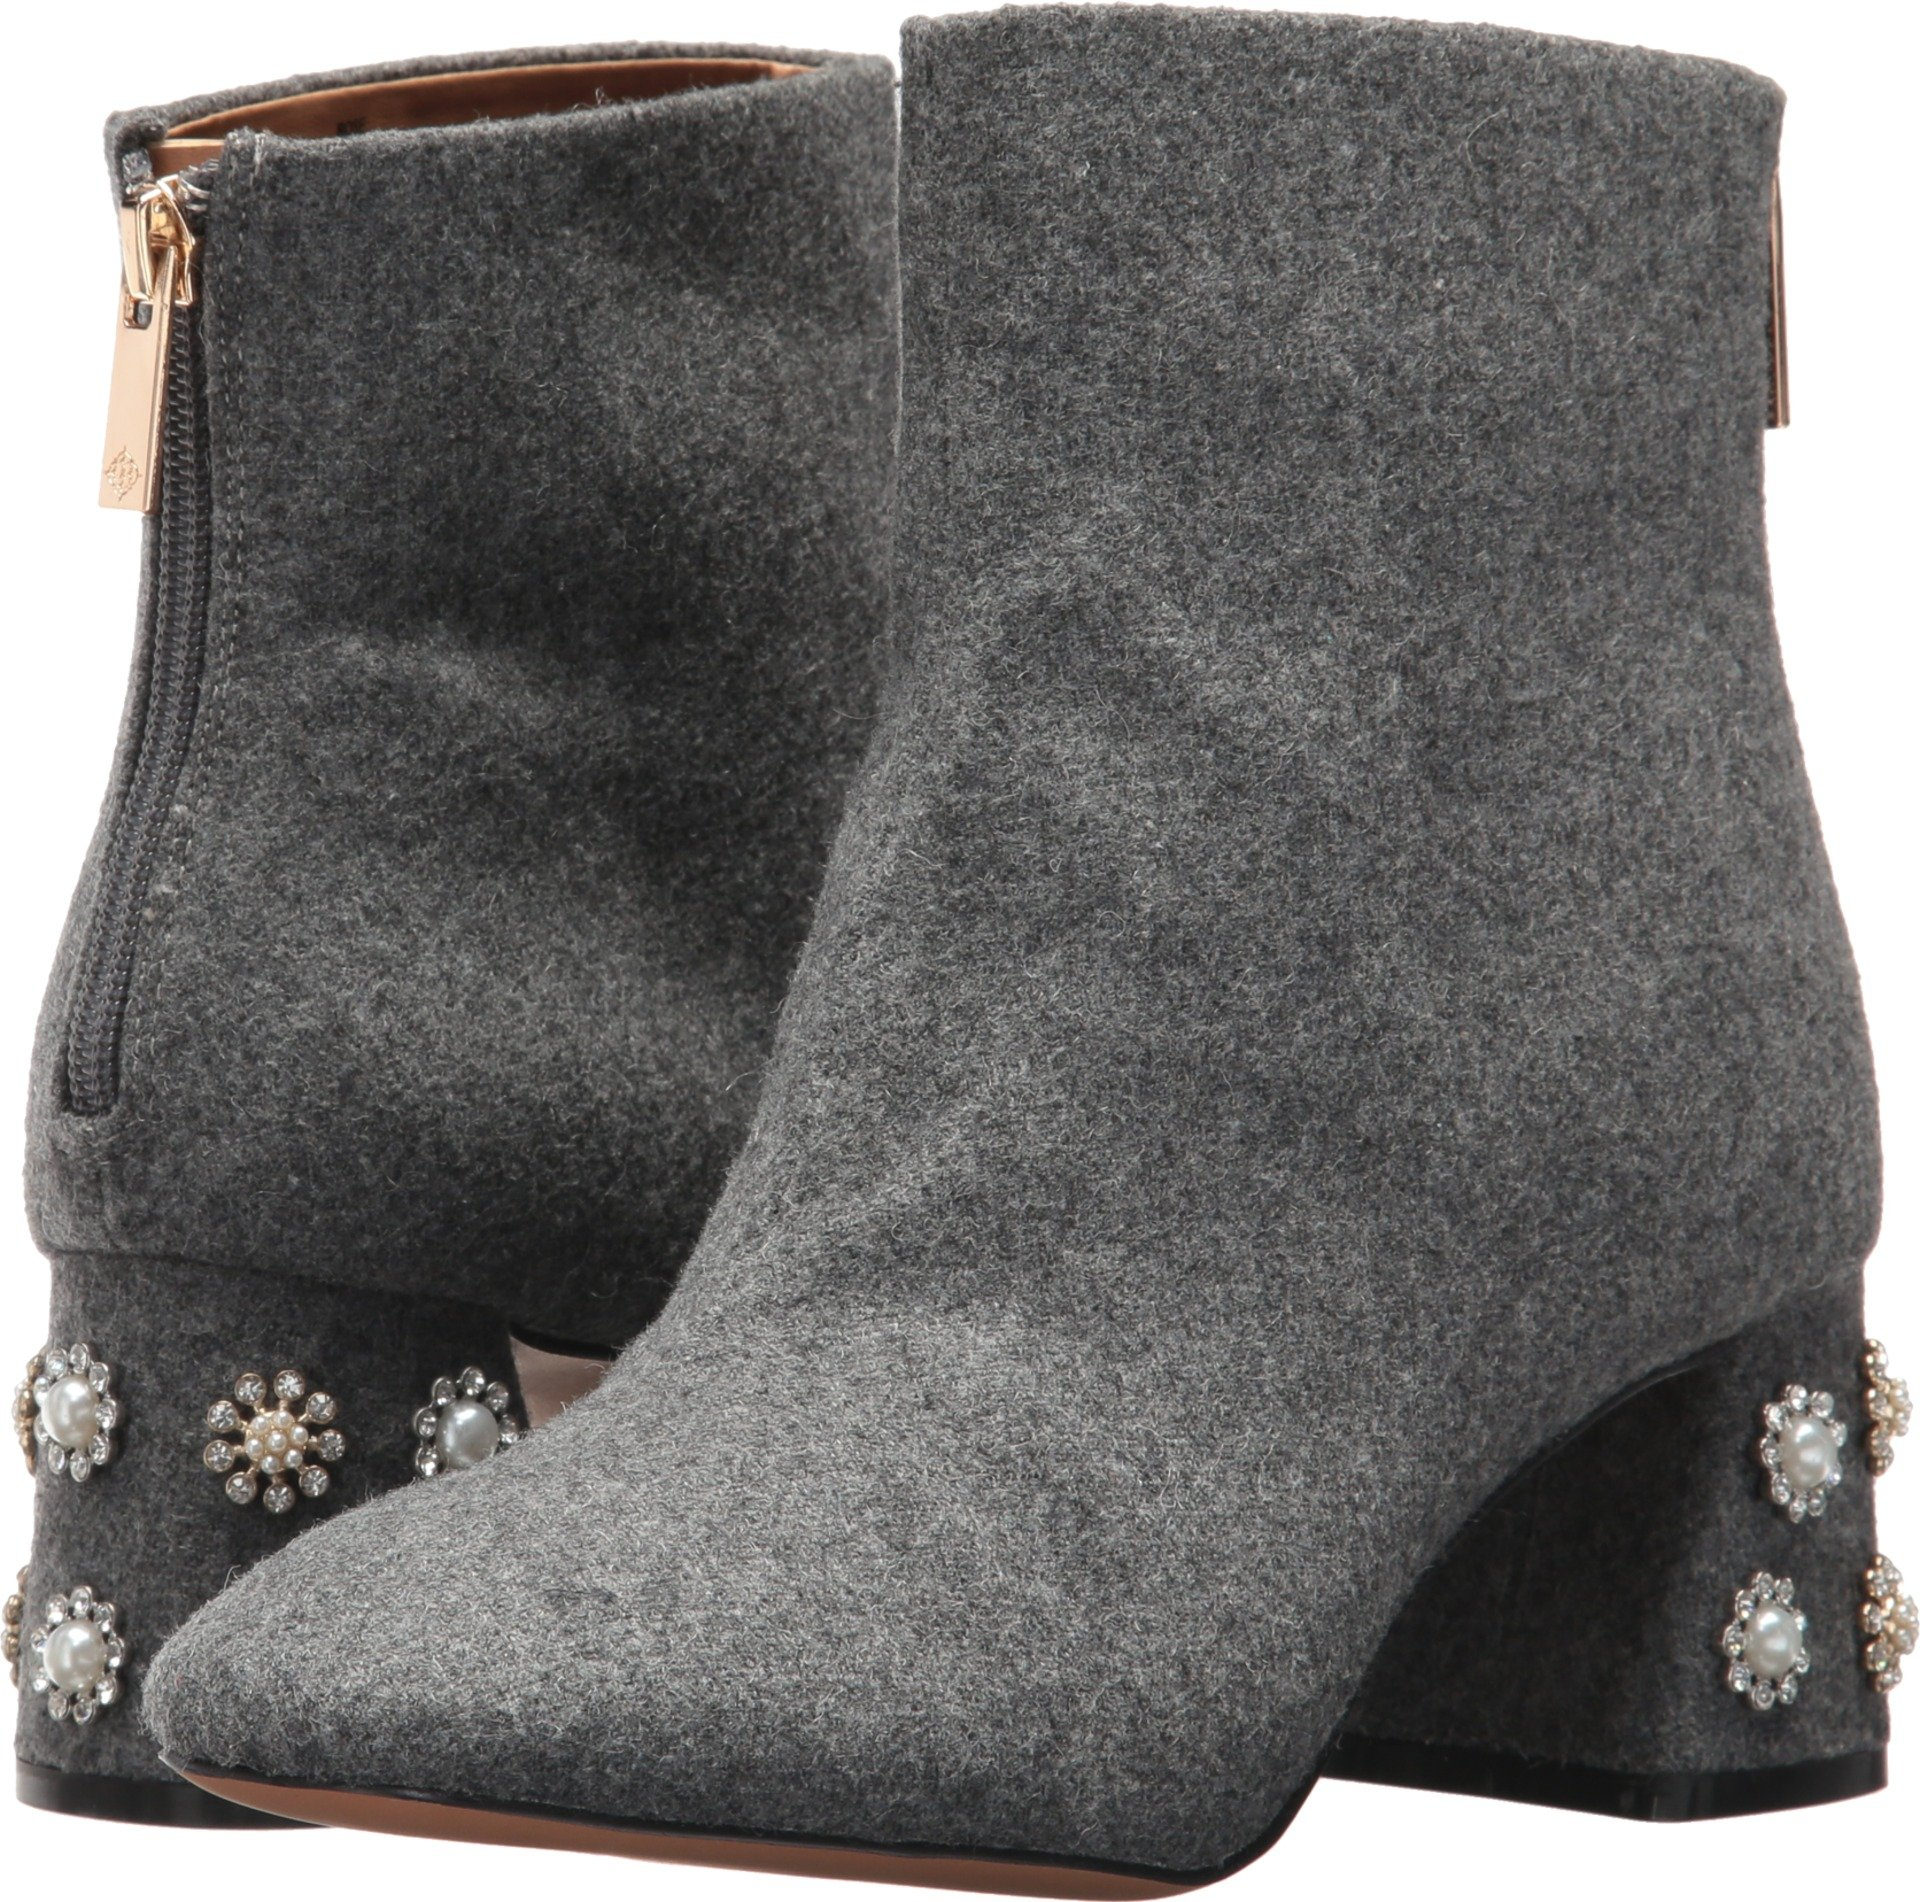 Nanette Lepore Women's Rose Fashion Boot, Grey, 7.5 M US